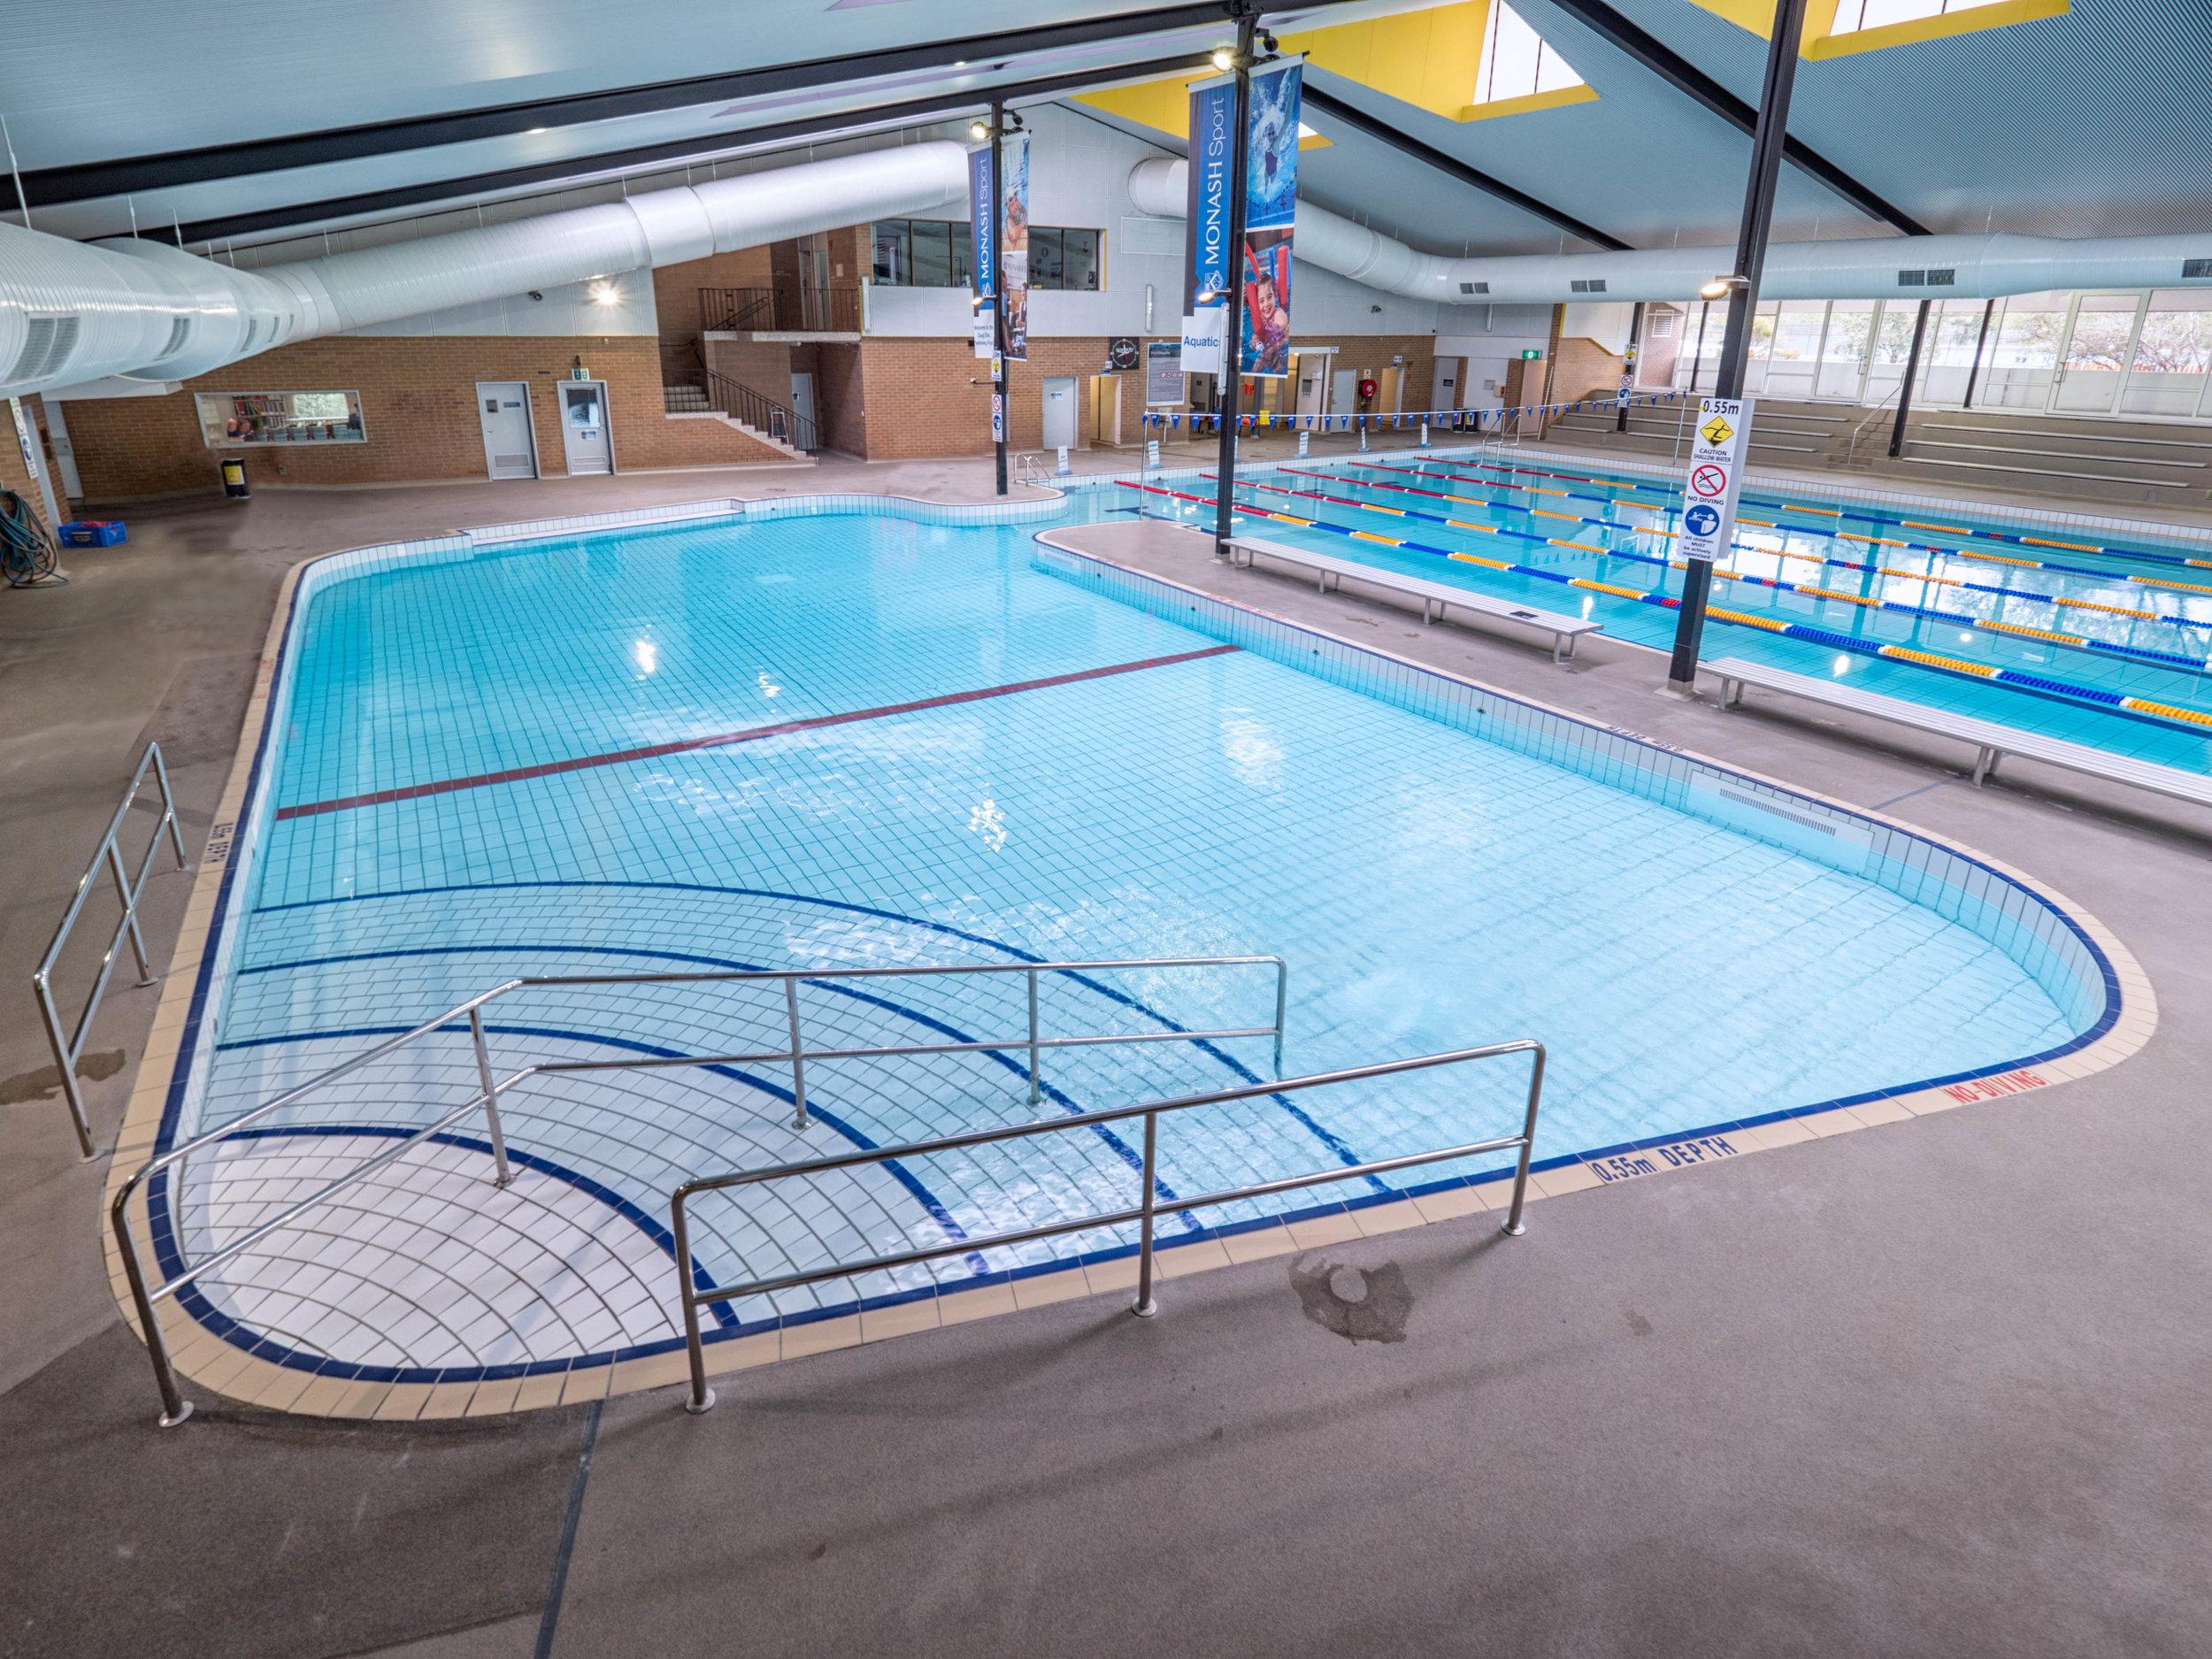 Monash Clayton Doug Ellis Swimming Pool_Resized 2.jpg